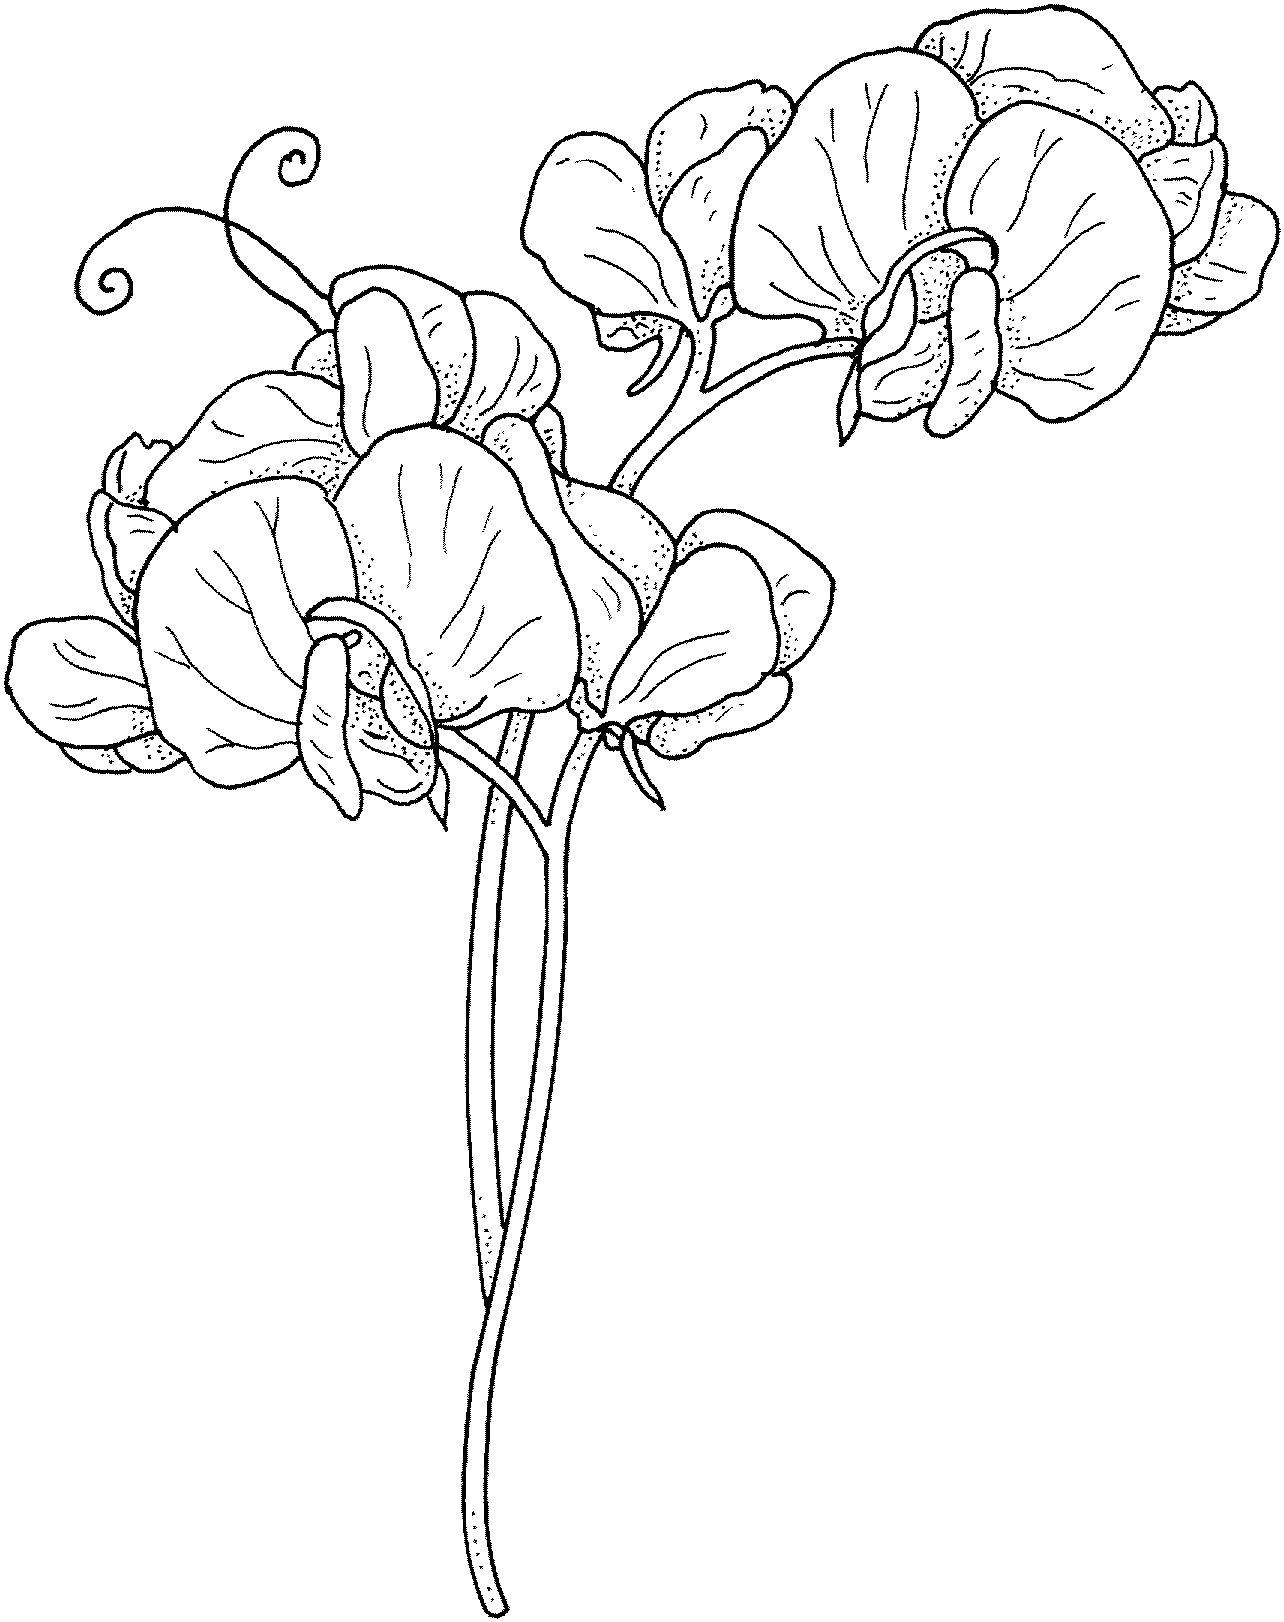 Pin de Patricia Kullman en Stop & Smell the Roses | Pinterest